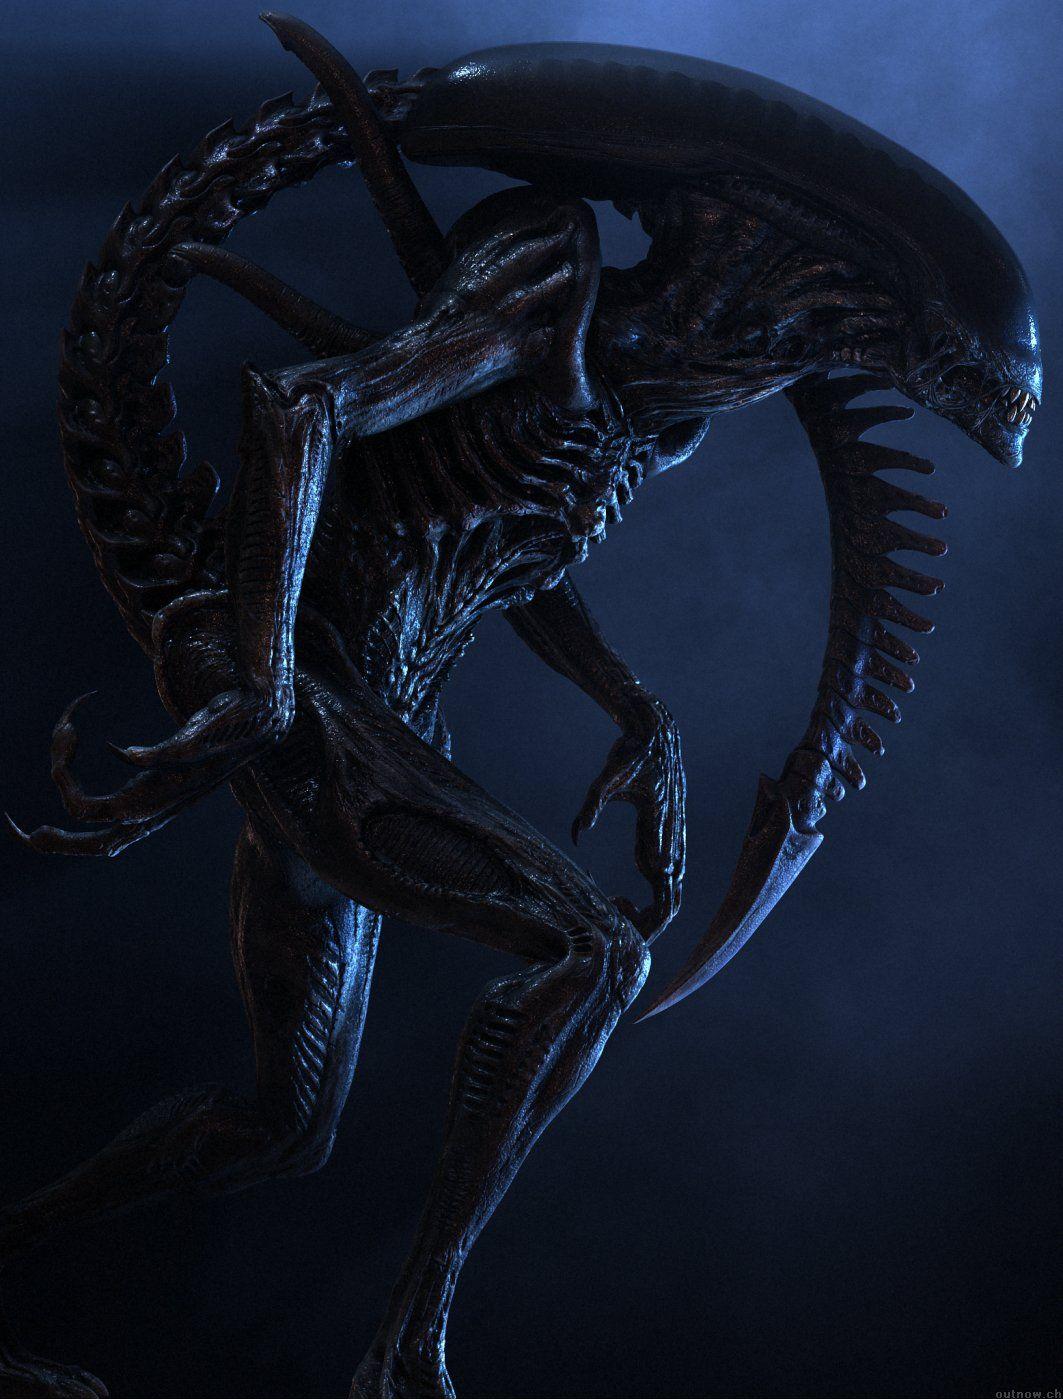 alien vs predator alien - Google Search